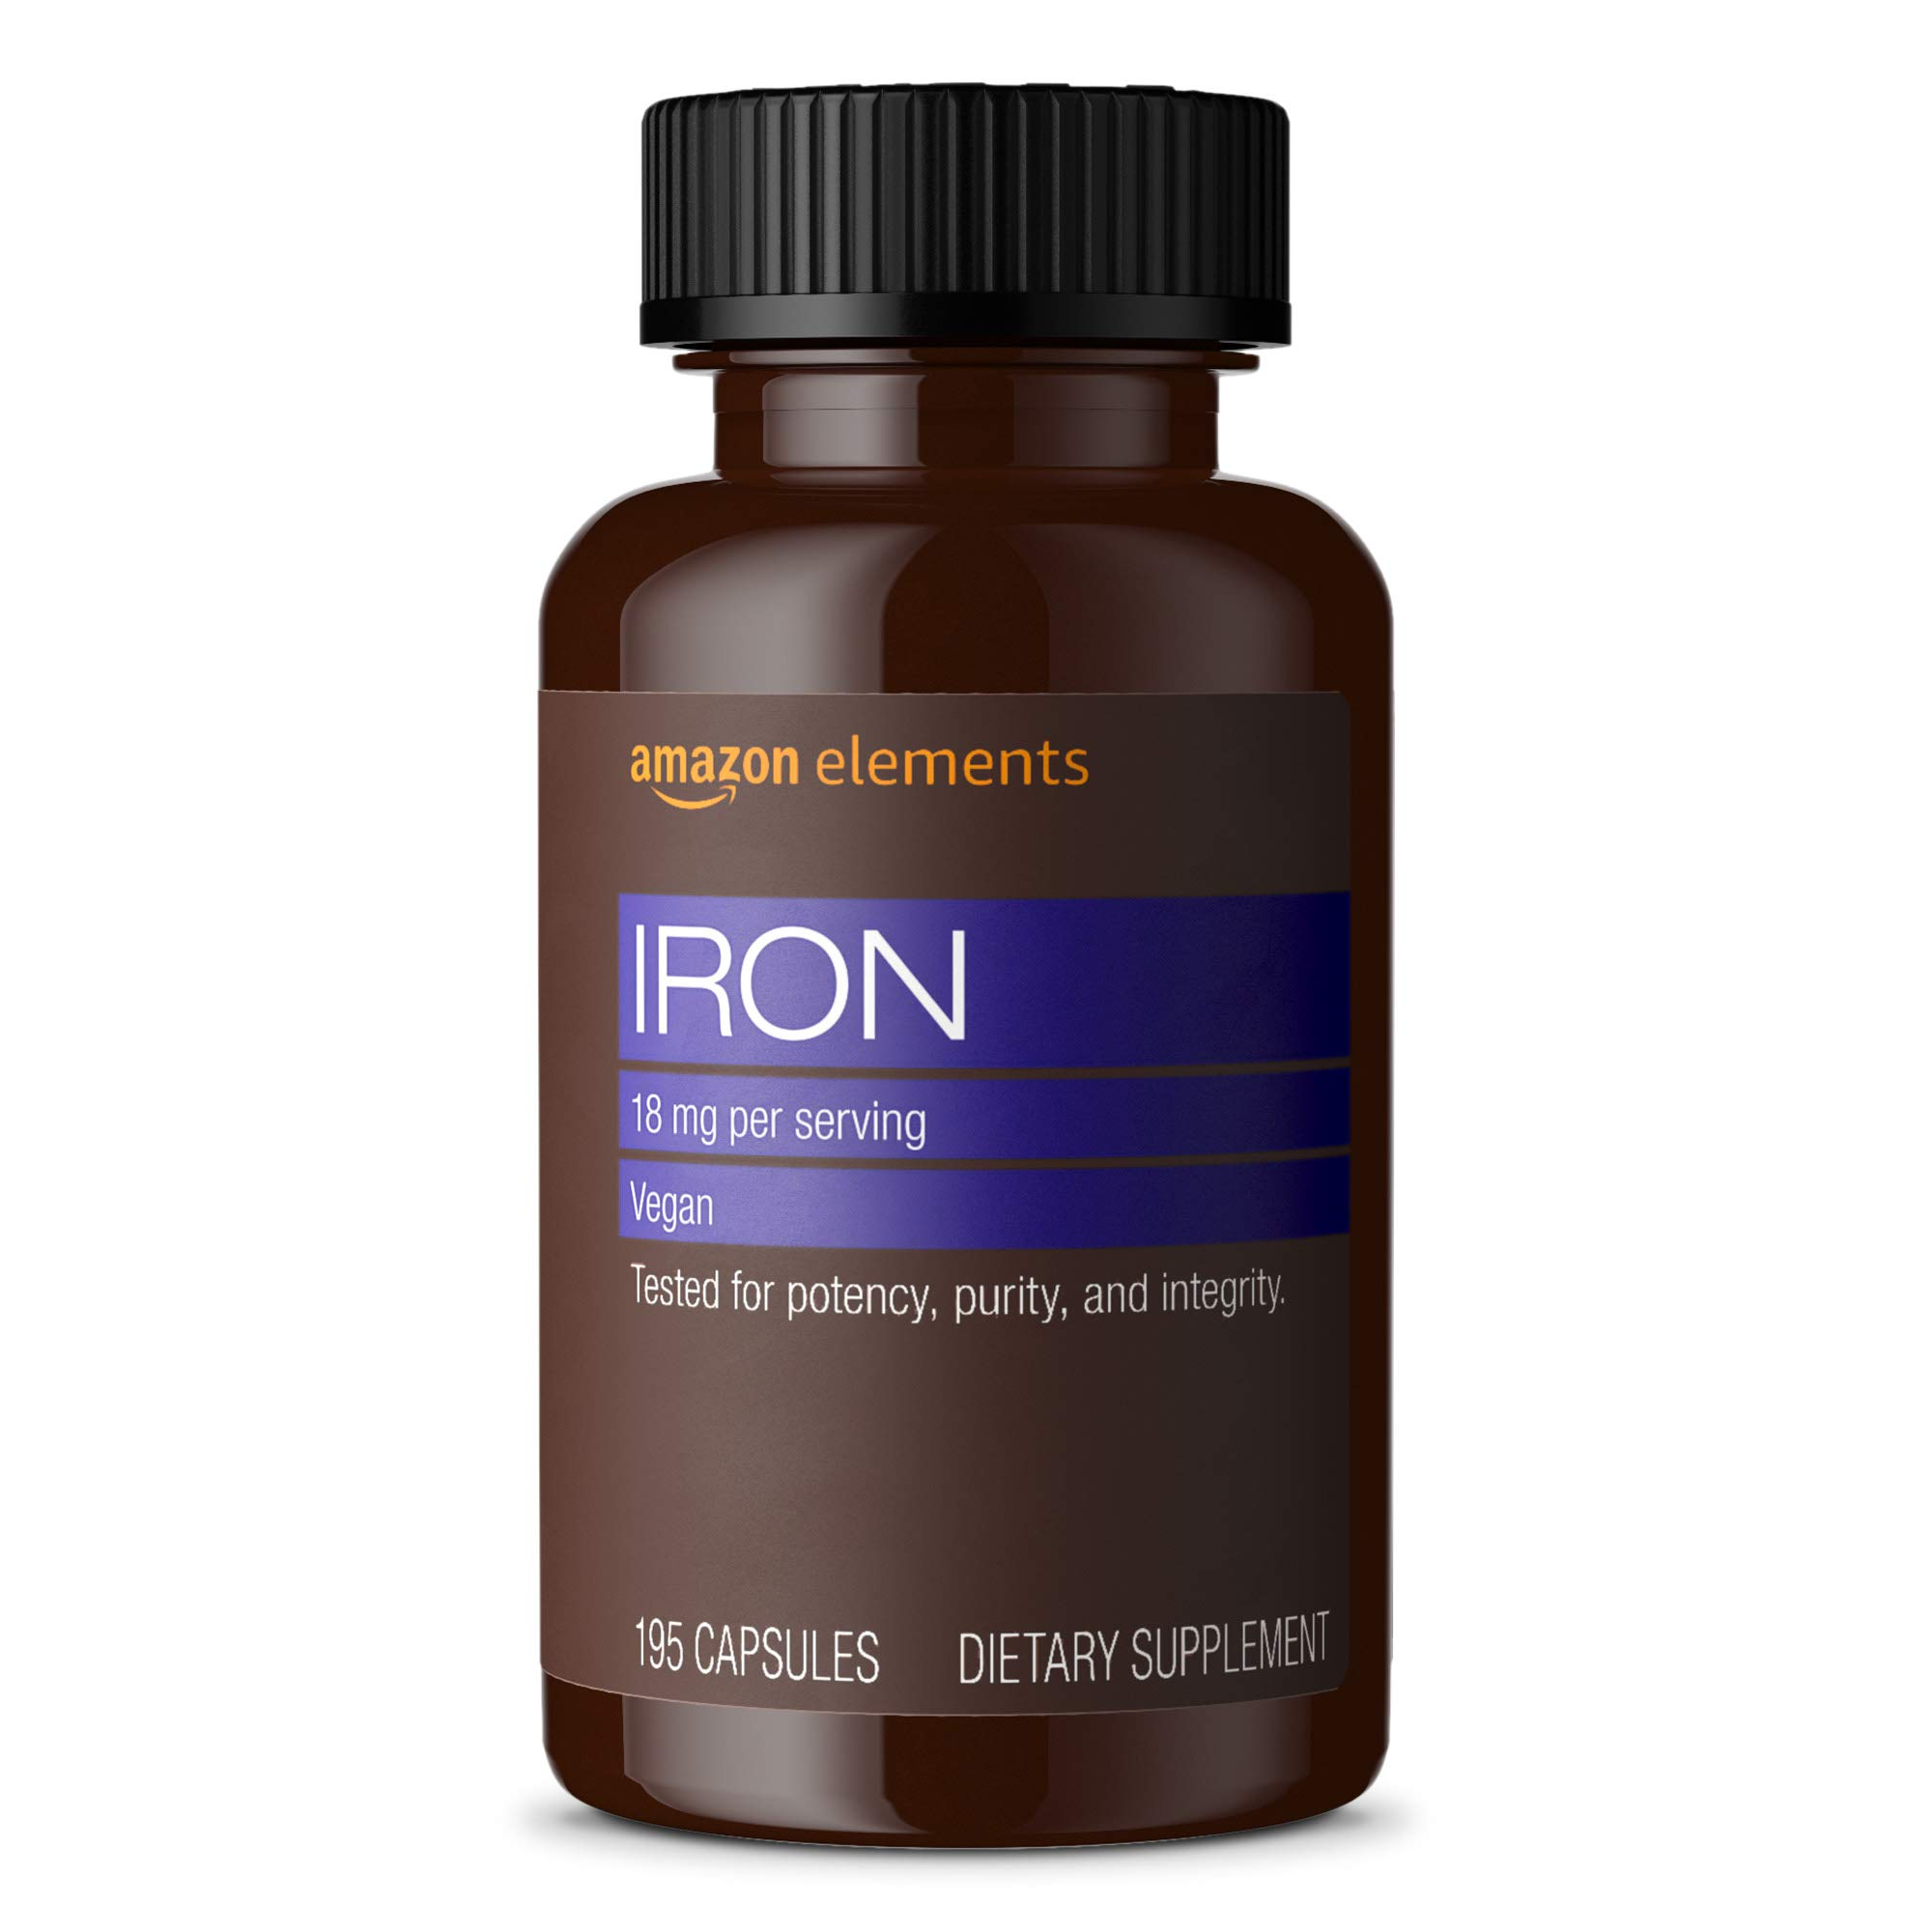 Amazon Elements Iron 18mg